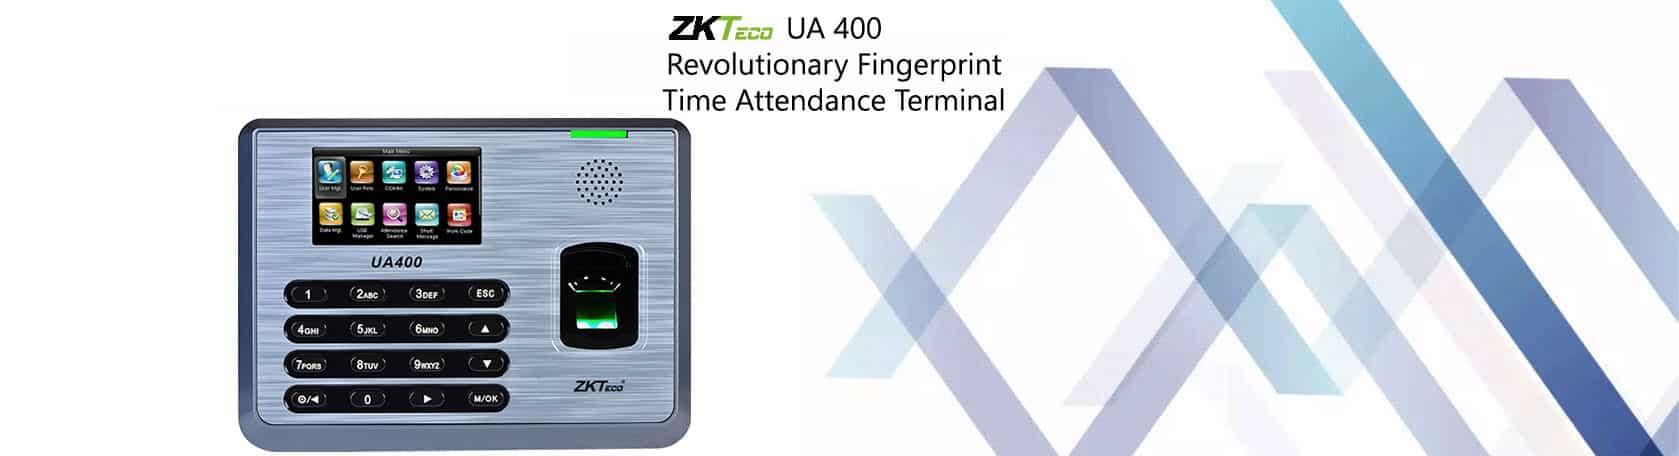 ZK TX628 UA400 TIME Management Fingerprint Time Attendance